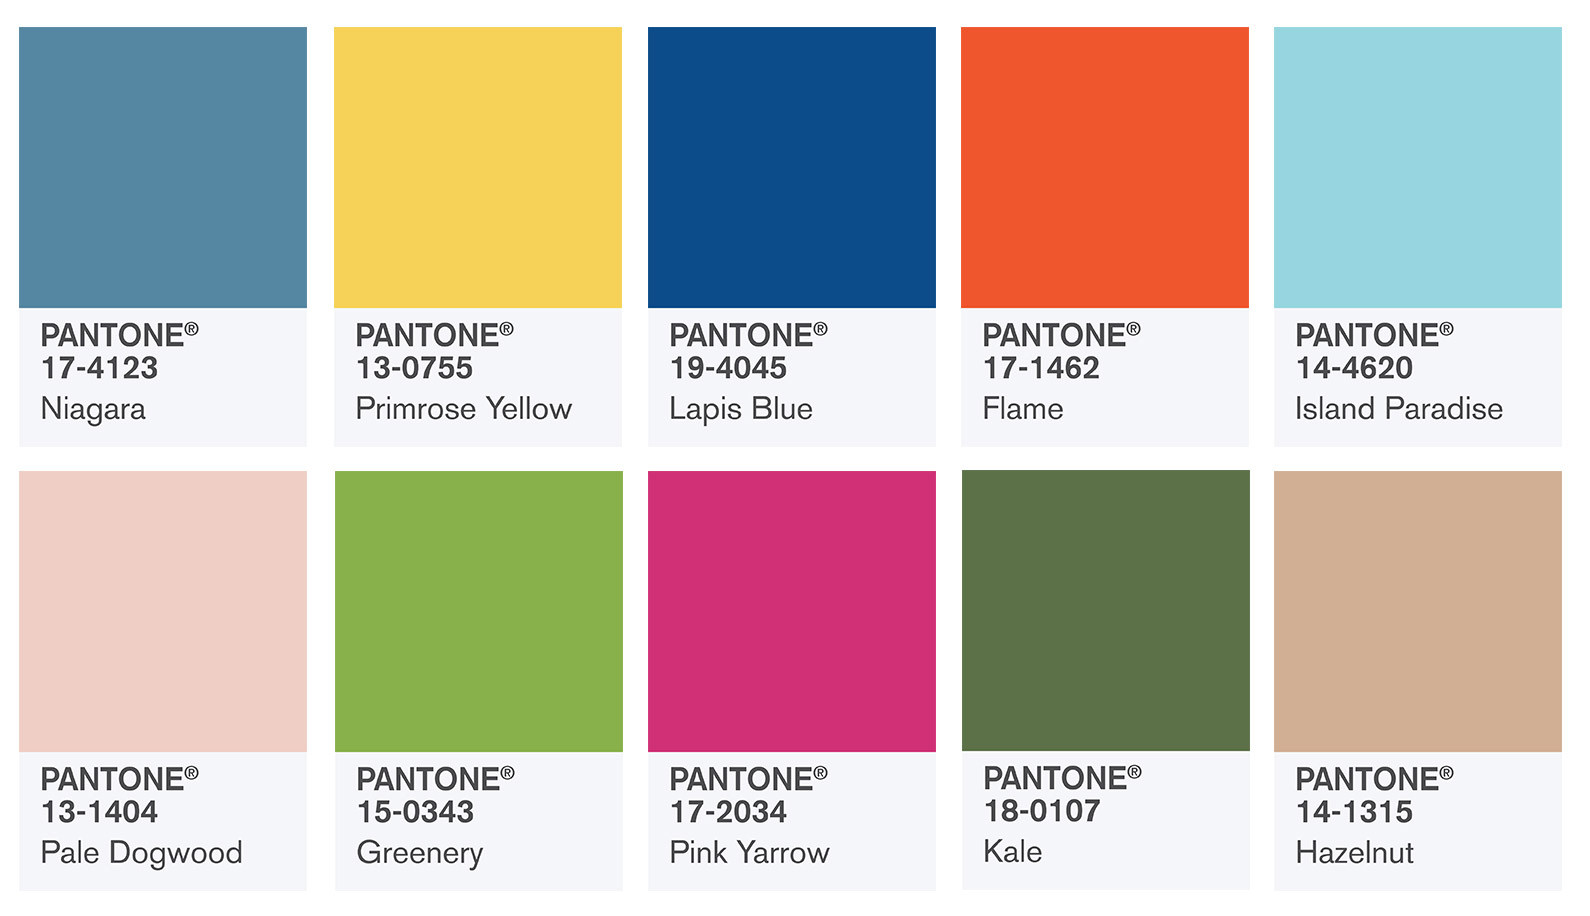 les 10 couleurs du printemps t 2017 avec des id es shopping en fin d article taaora blog. Black Bedroom Furniture Sets. Home Design Ideas